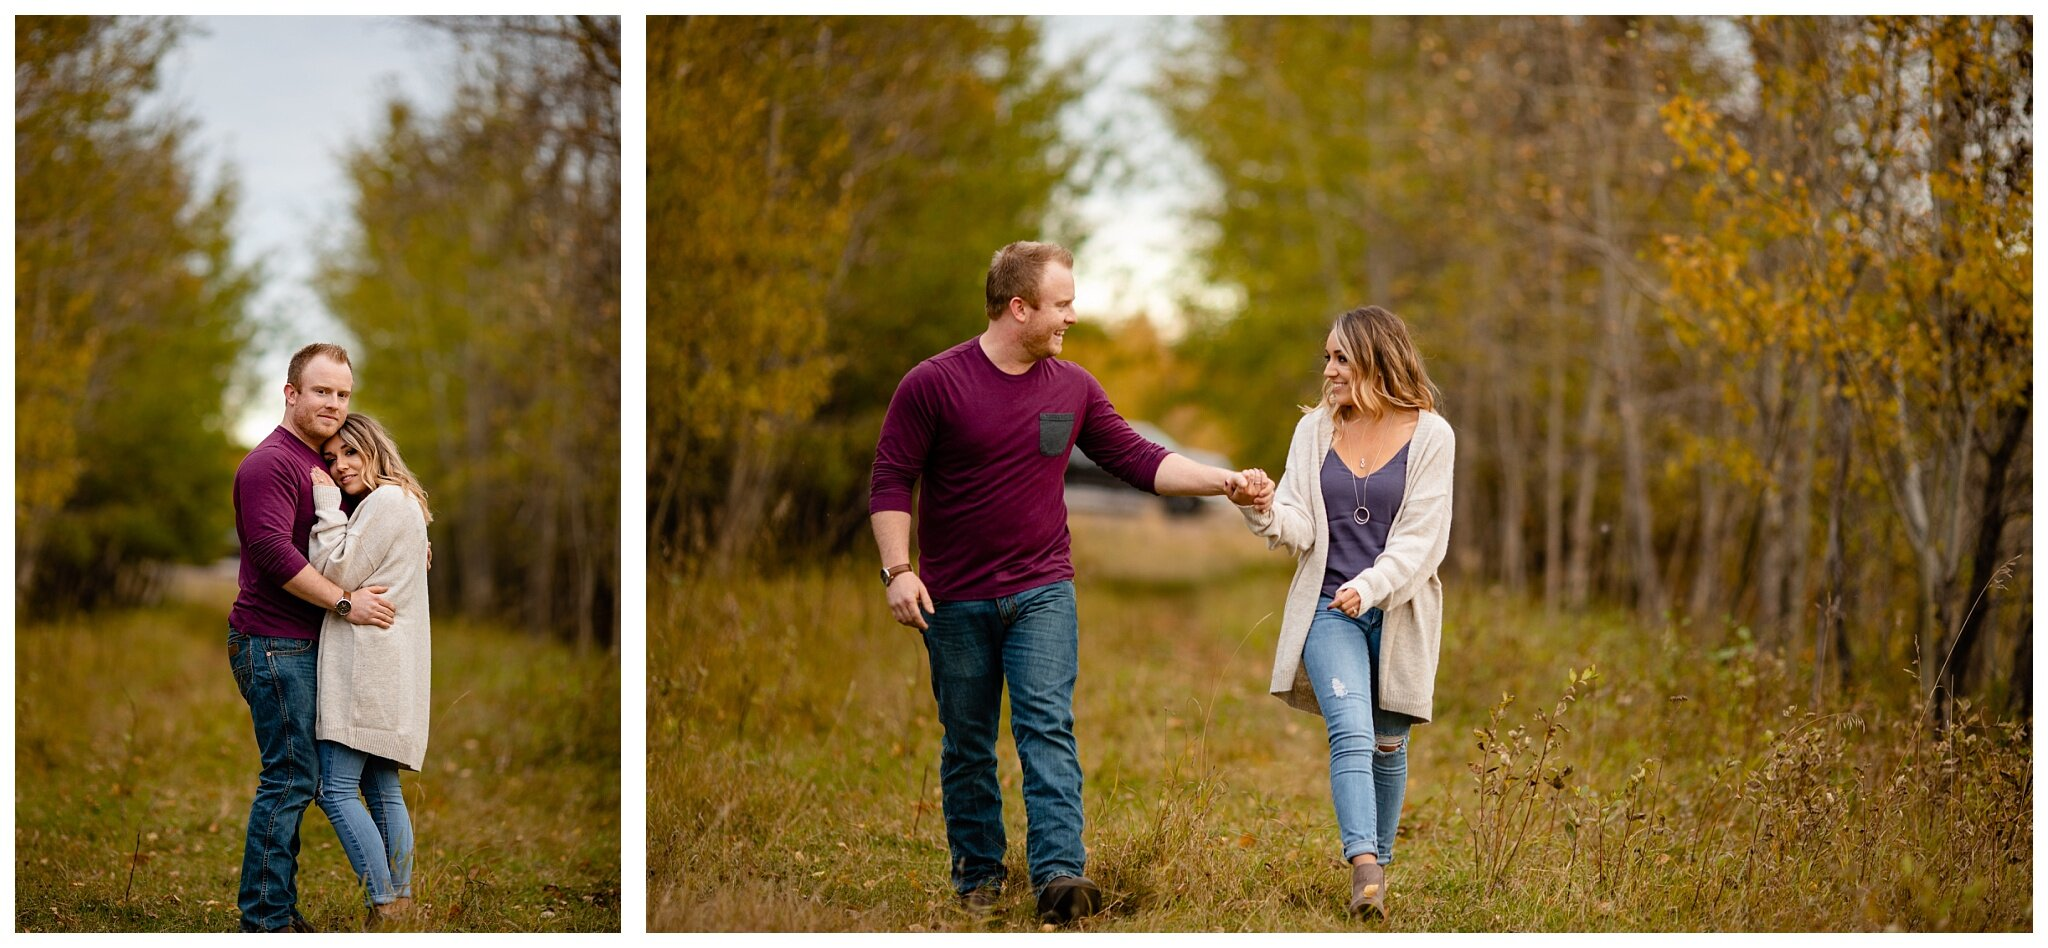 Edmonton Engagement Photographer Romantic Couples Photos Local YEG Strathcona County_0010.jpg